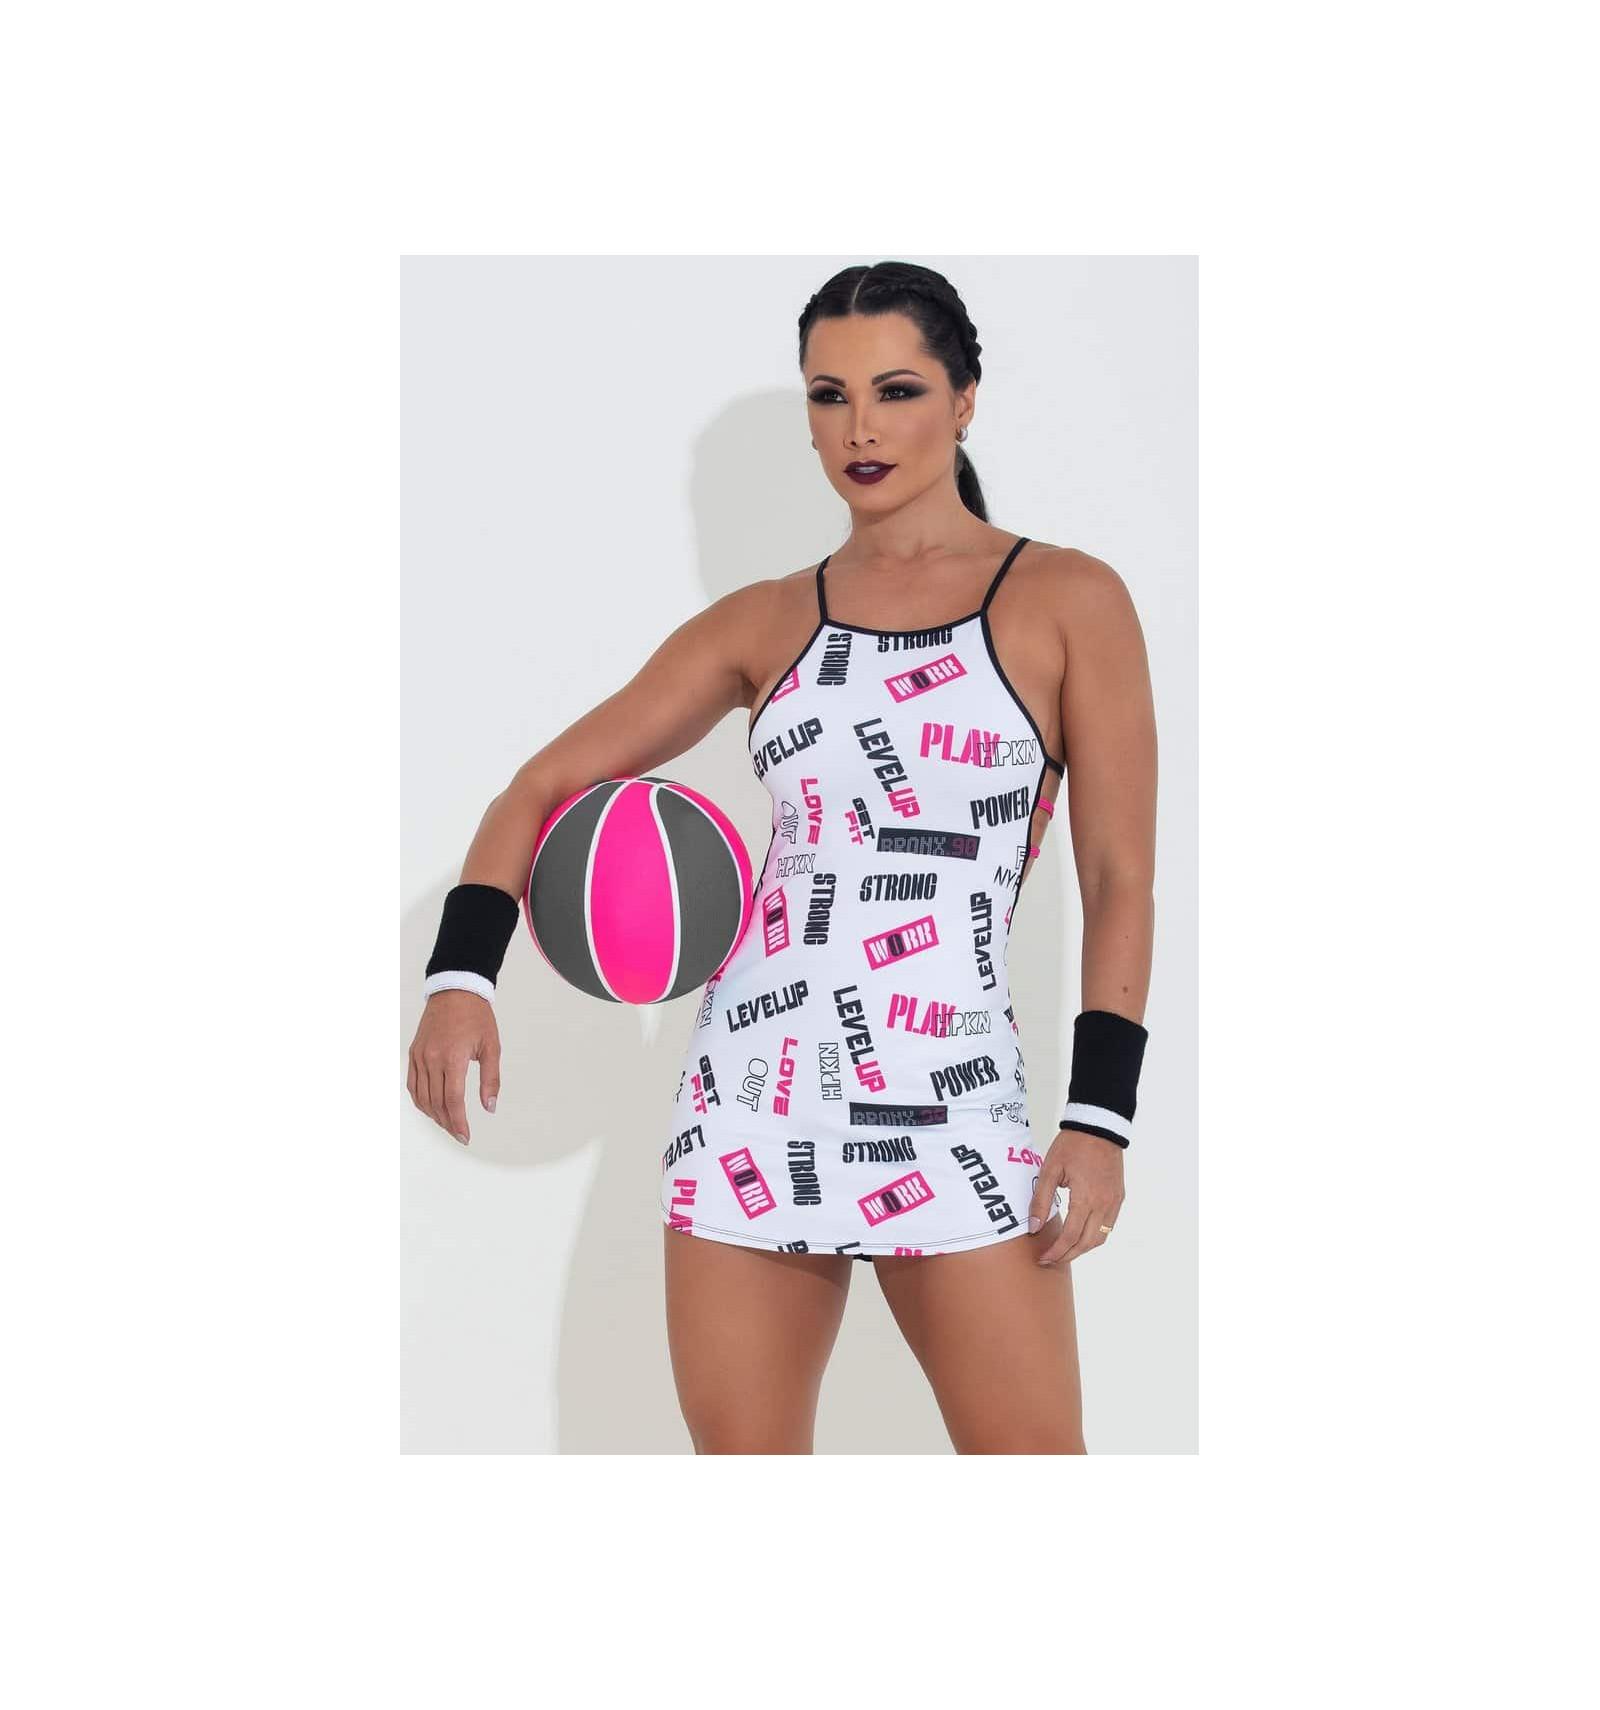 74648edf24e8 Letné dámske športové tričko Playoff Splash